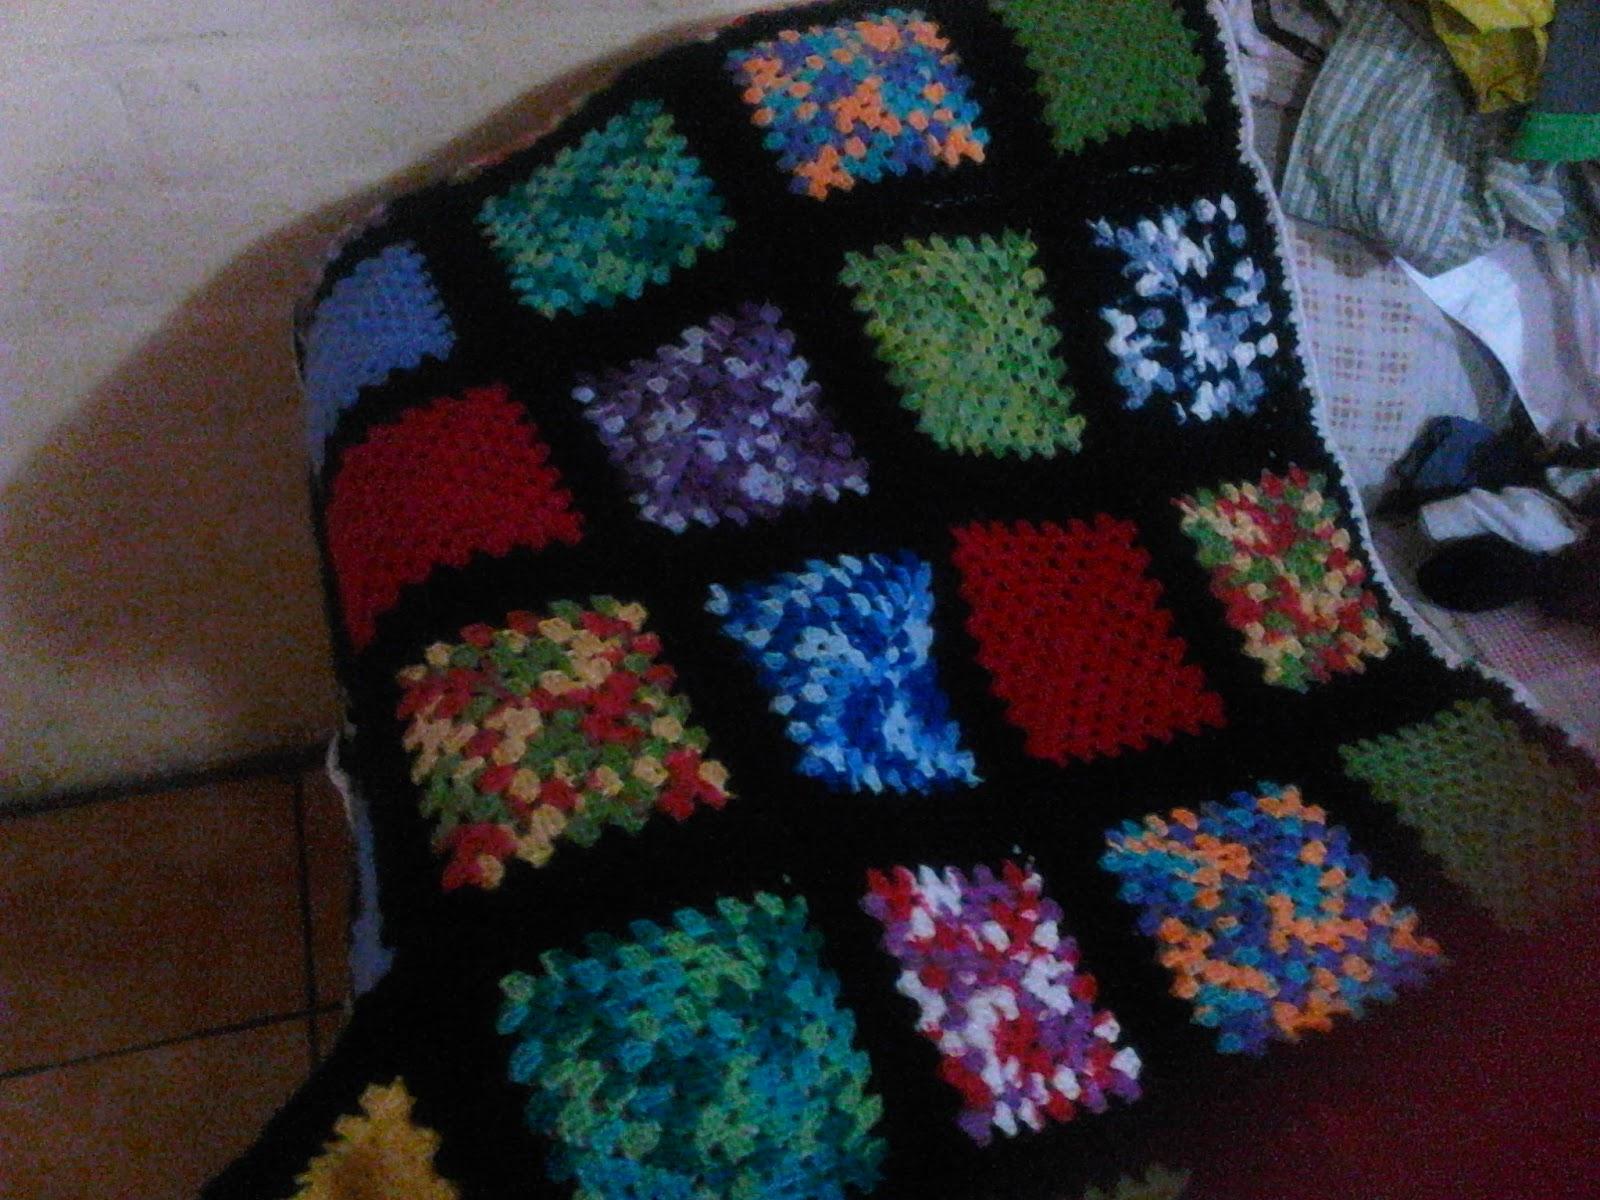 Excelente Arte Crochet Enmarcado Viñeta - Ideas de Arte Enmarcado ...